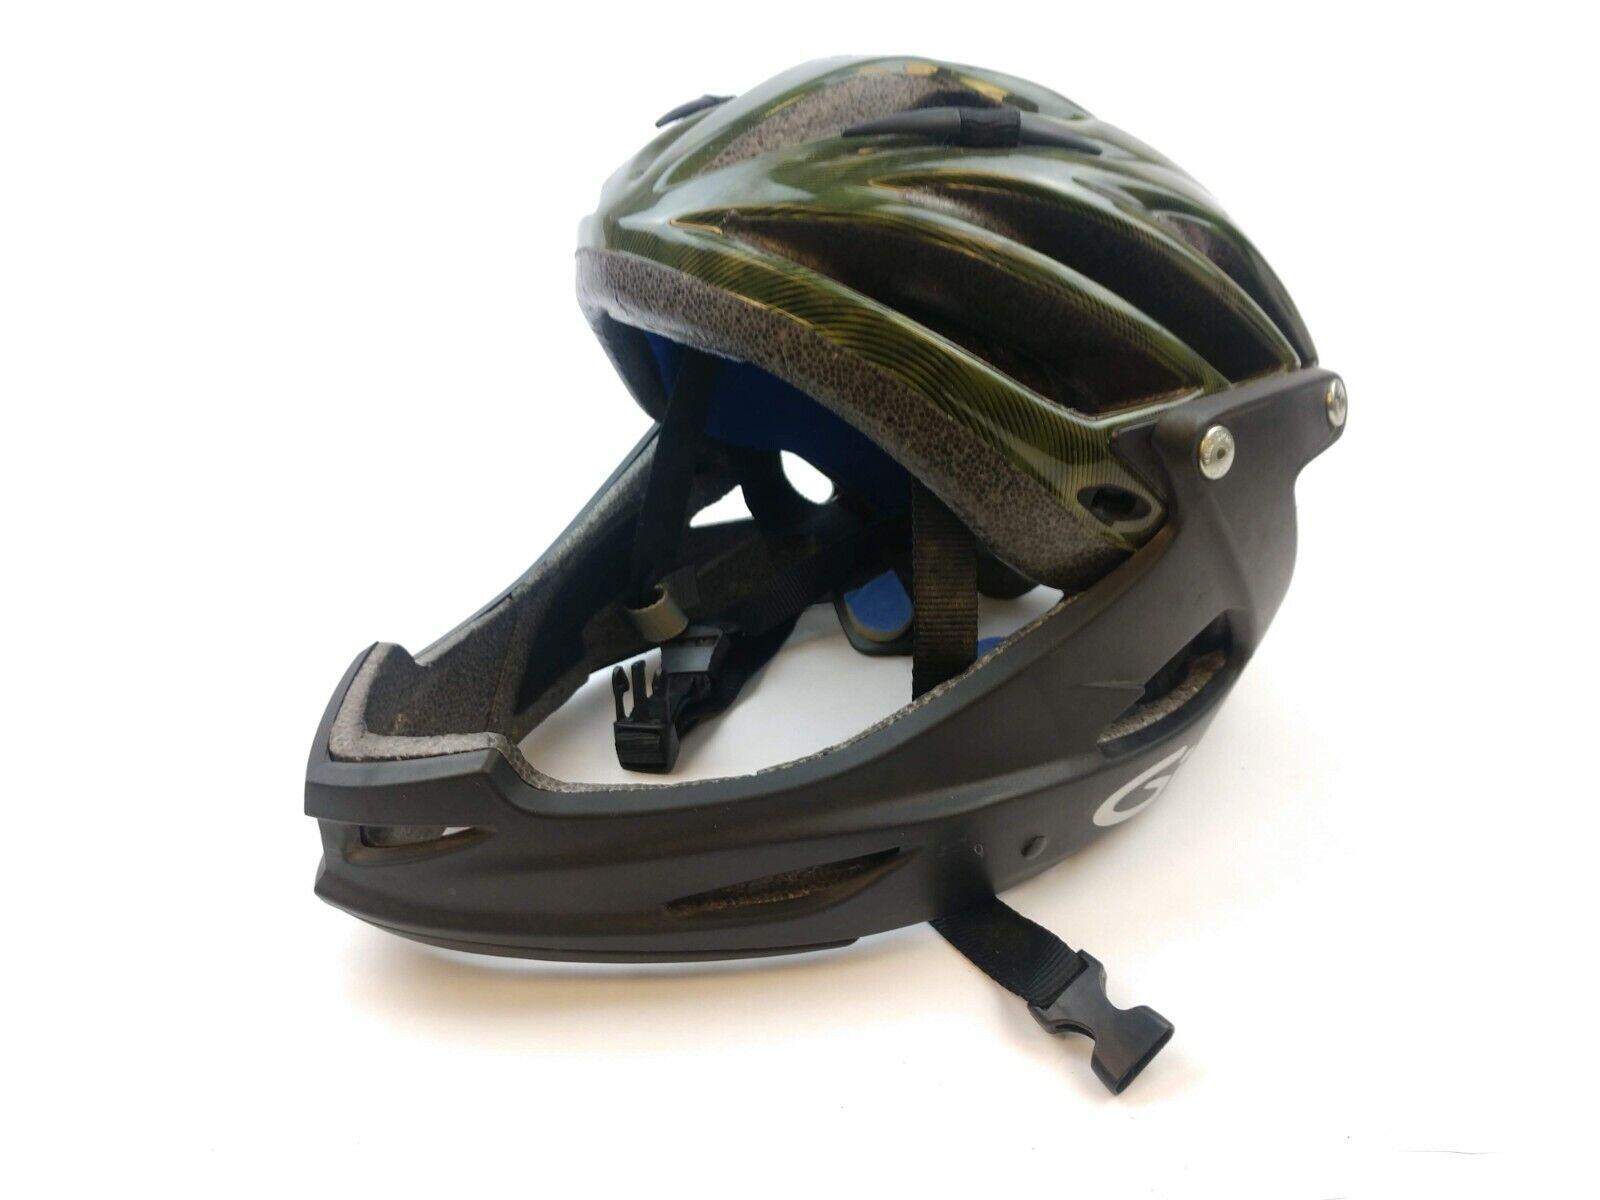 Giro Flume Aftermarket Helmet Replacement Foam Pads Cushions Kit Bike Liner Set